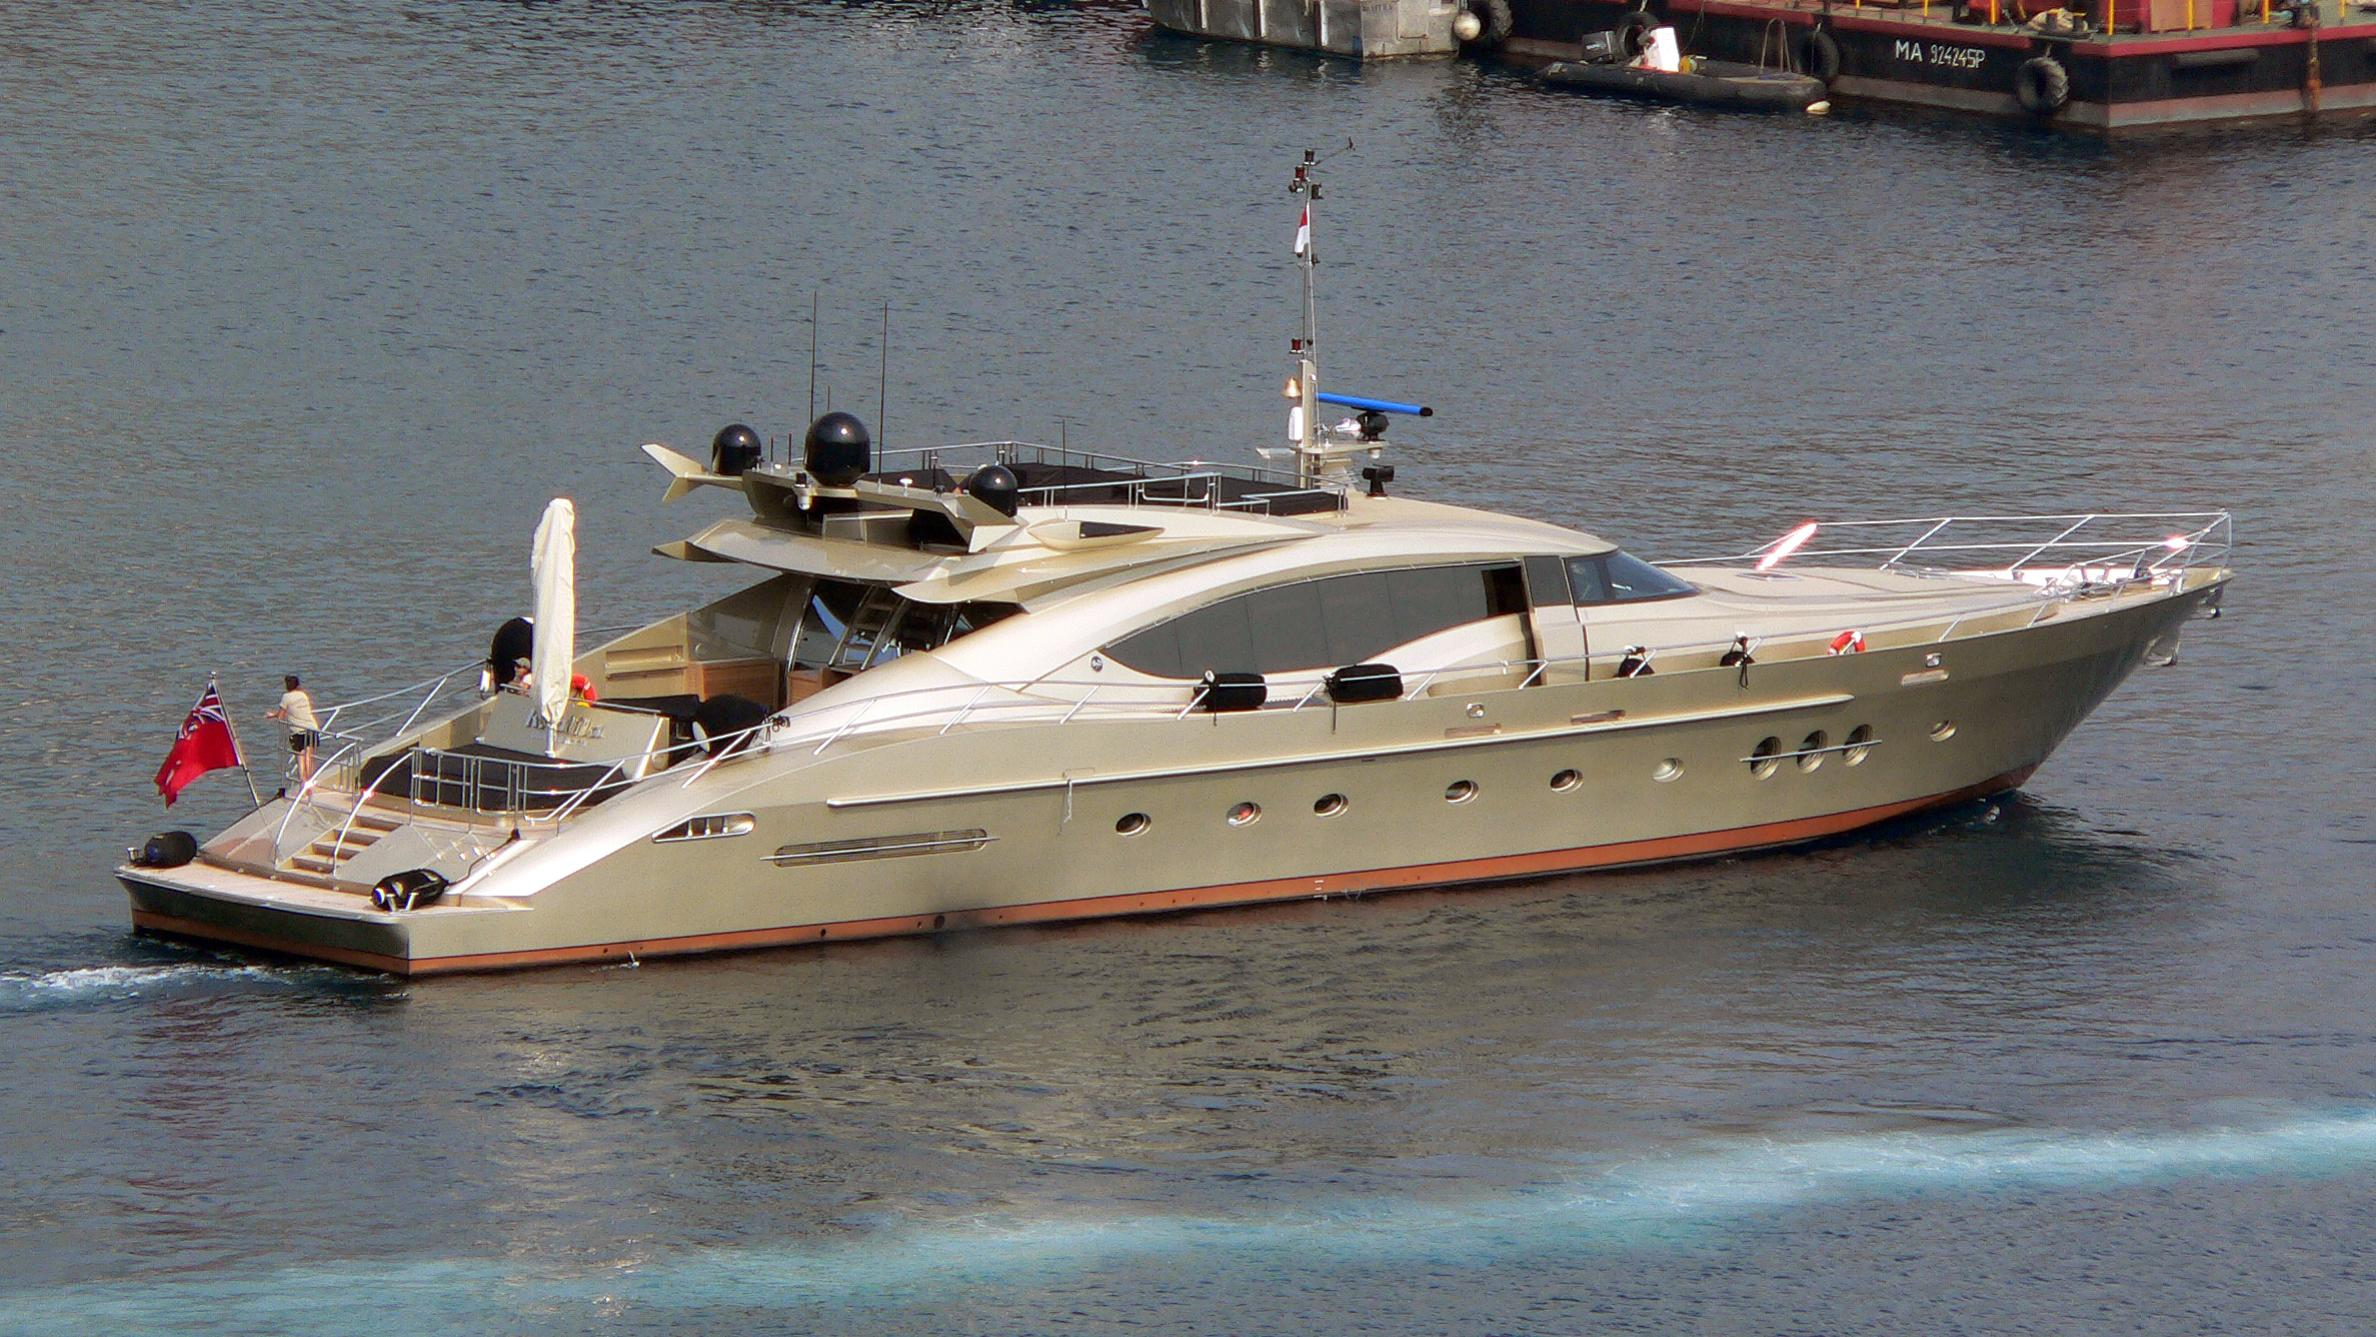 lucy ii db9 khalila motoryacht palmer johnson 120 37m 2005 profile before refit